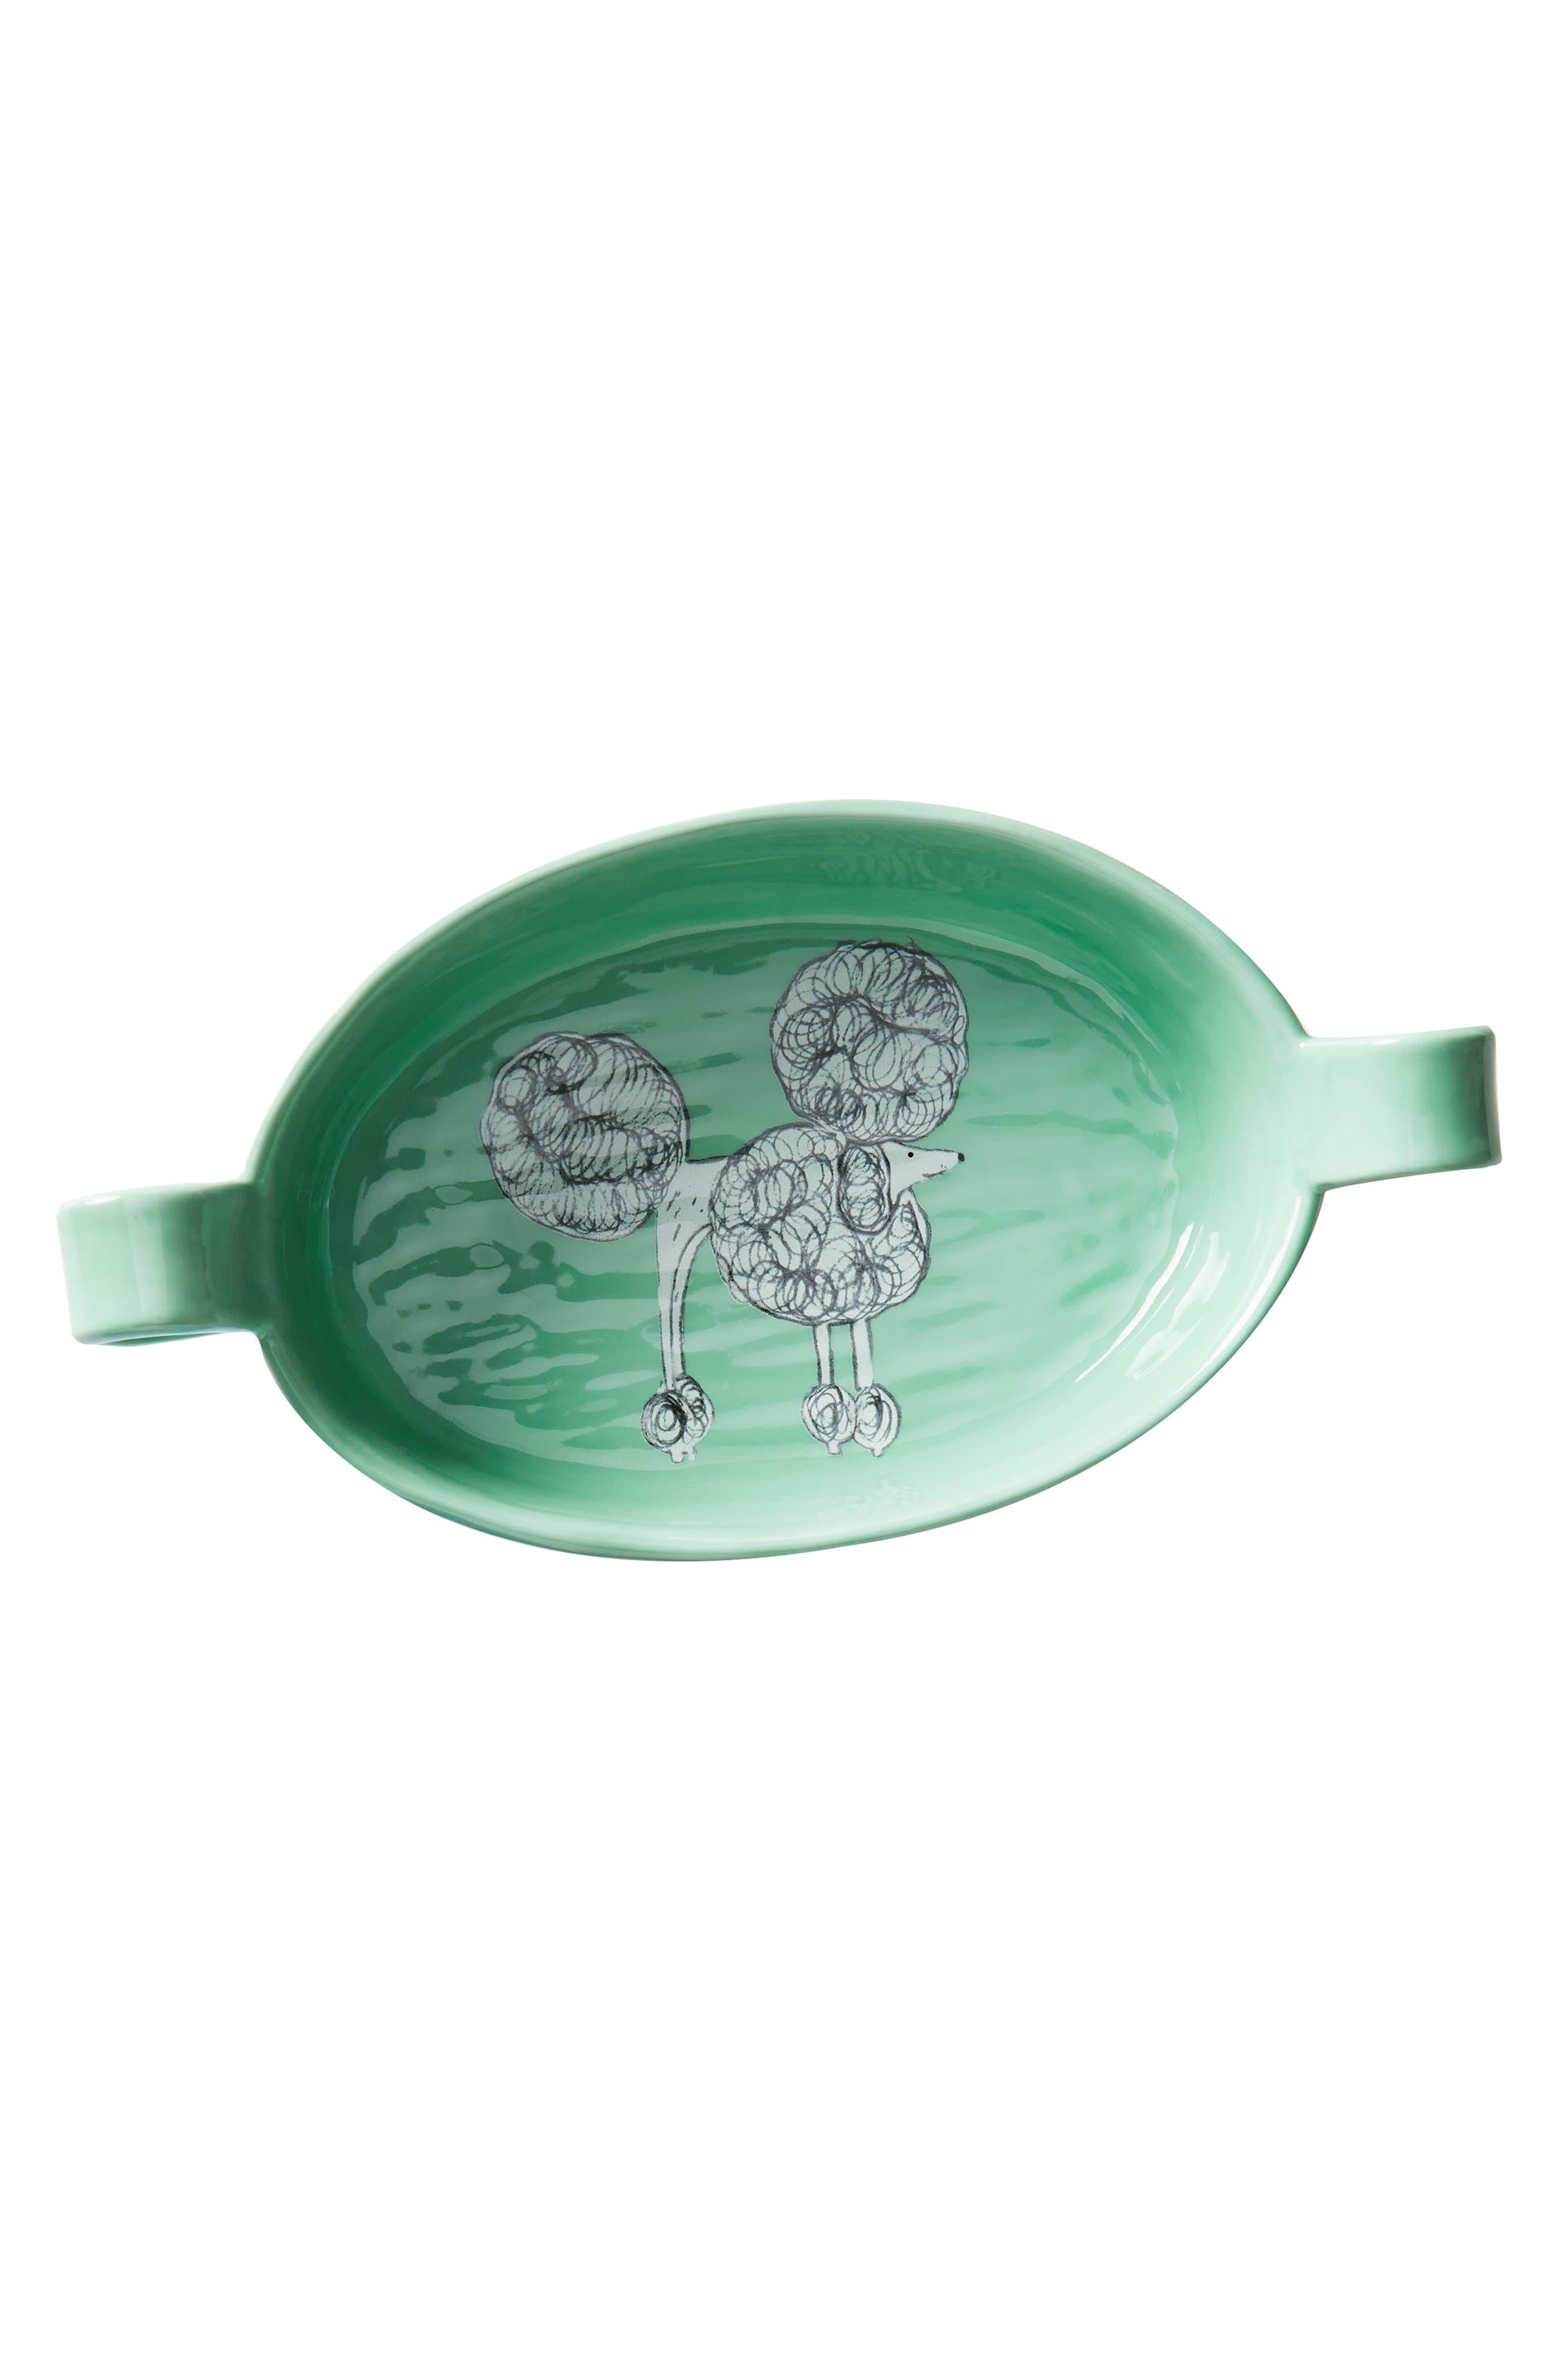 Painted Pup Stoneware Gratin Dish,                             Alternate thumbnail 3, color,